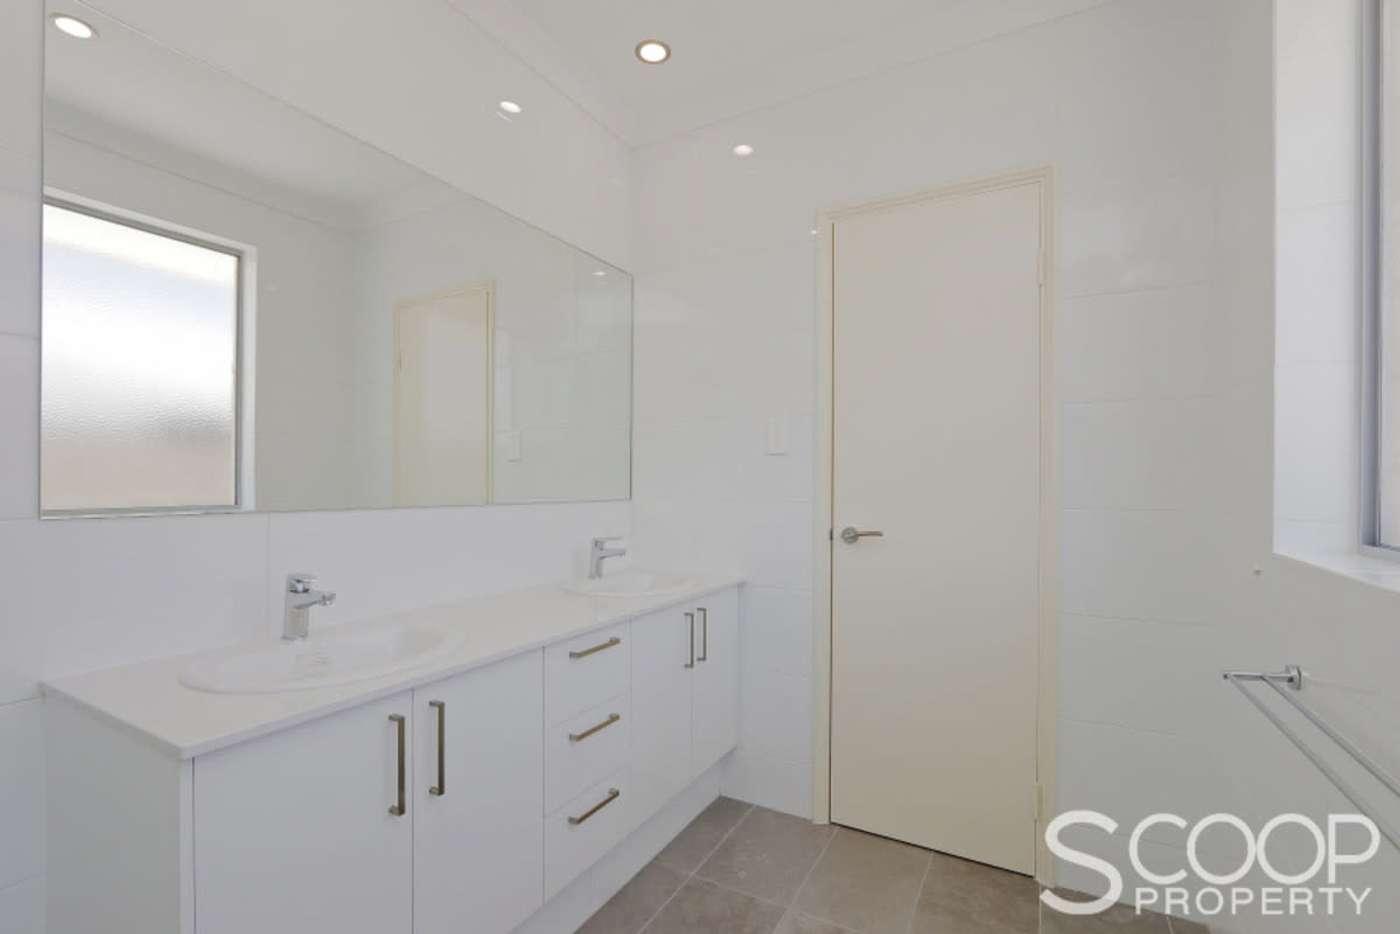 Sixth view of Homely house listing, 19 Laurina Way, Beeliar WA 6164